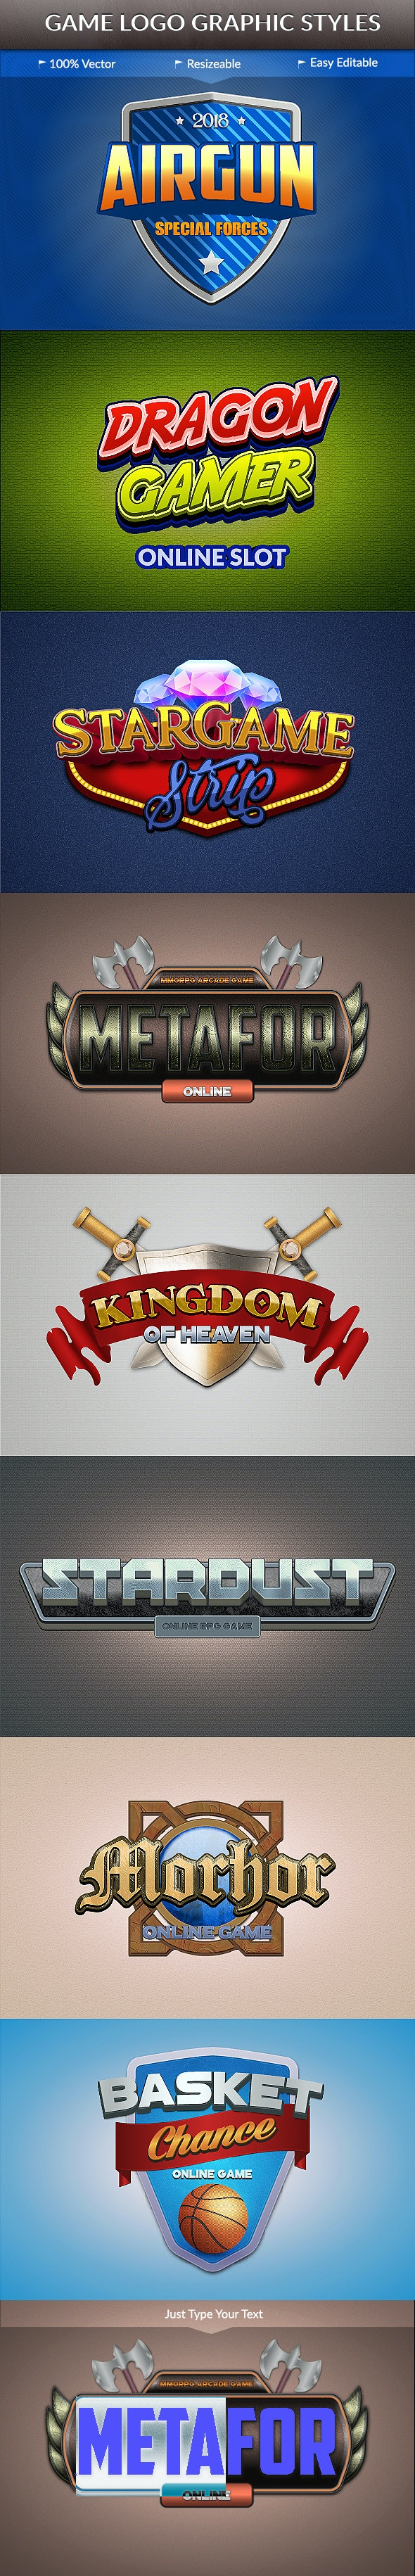 Game Logo Text Styles - Styles Illustrator